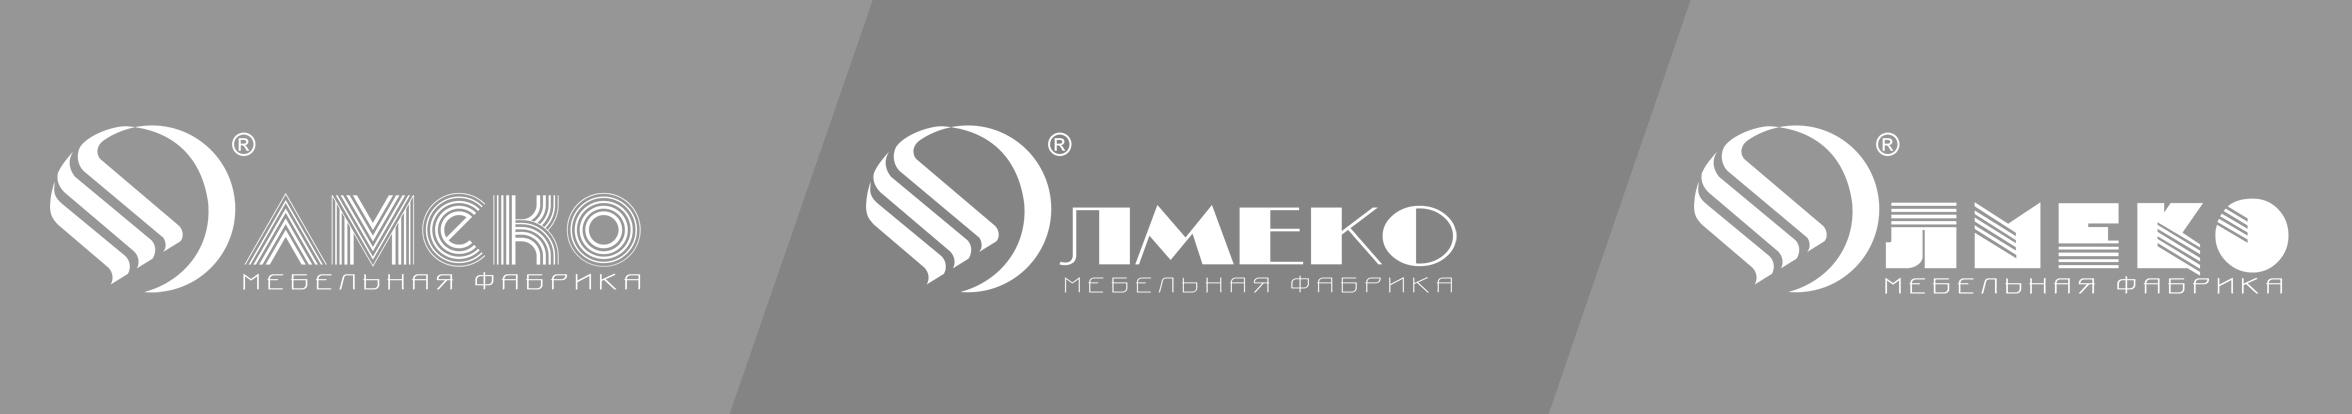 Ребрендинг/Редизайн логотипа Мебельной Фабрики фото f_9615491f316ab484.jpg